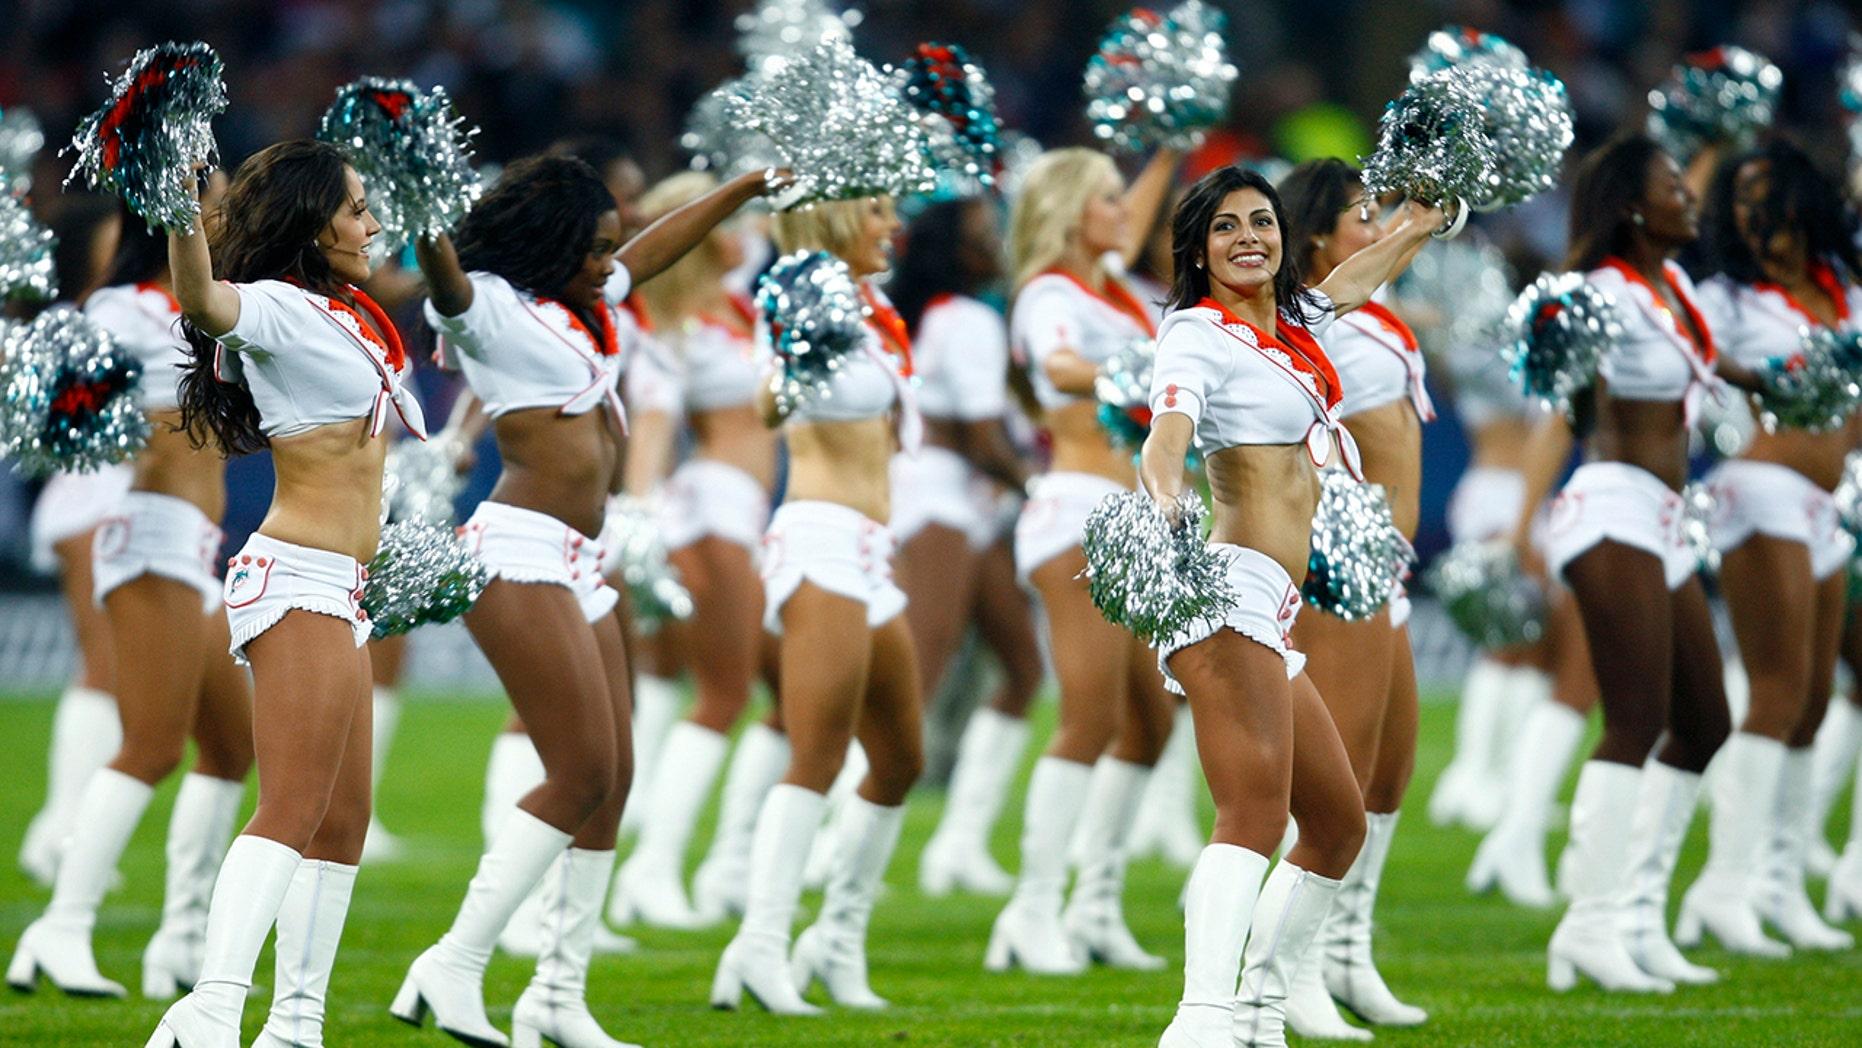 638ba82b9 A former Miami Dolphins cheerleader filed a complaint against the team and  the NFL on Thursday